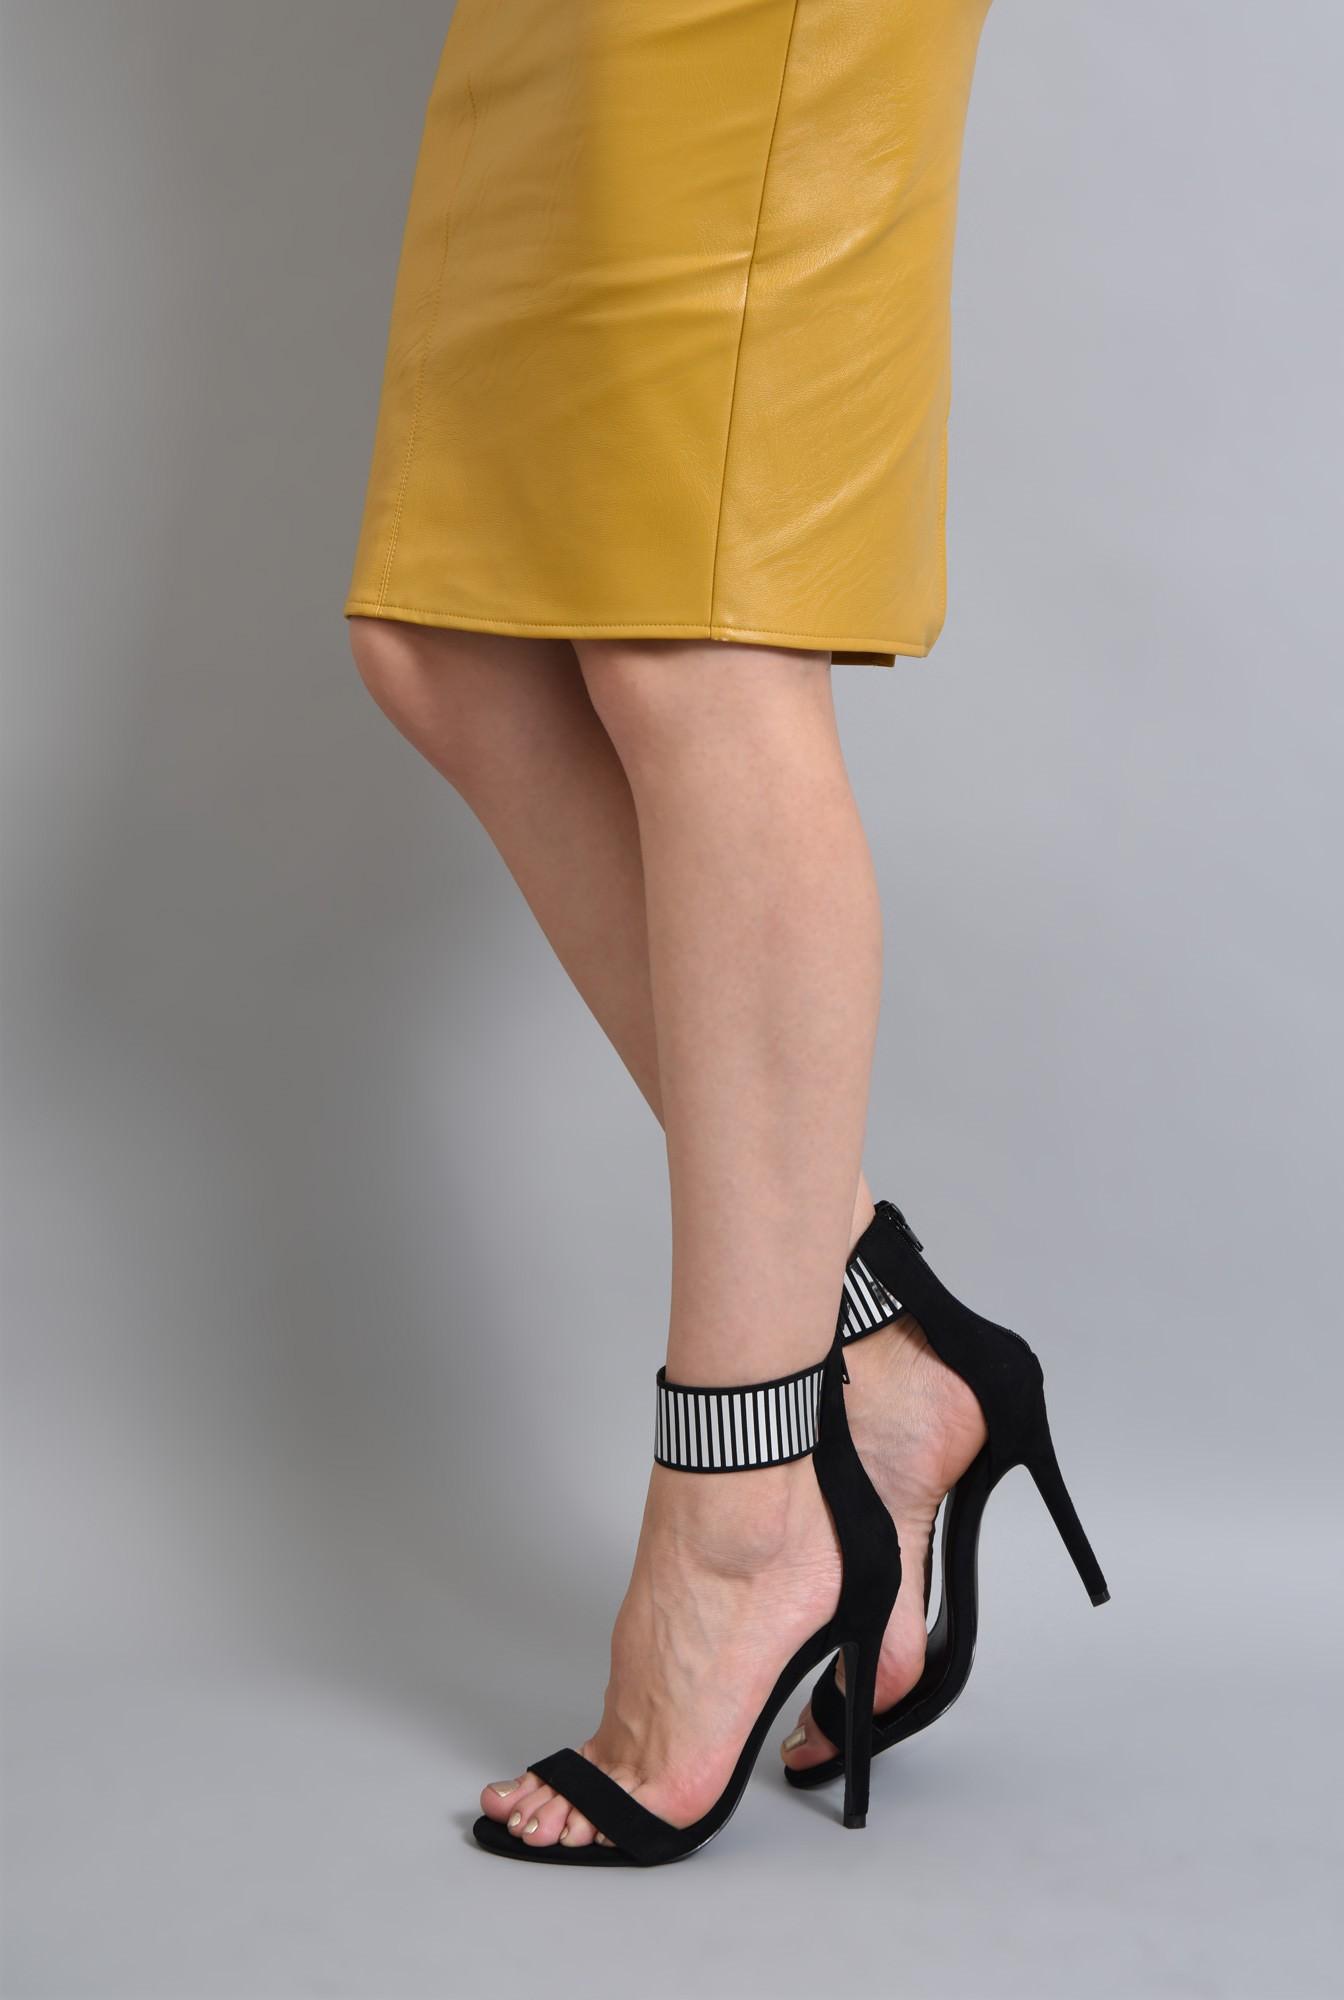 4 - sandale de ocazie, barete, toc subtire